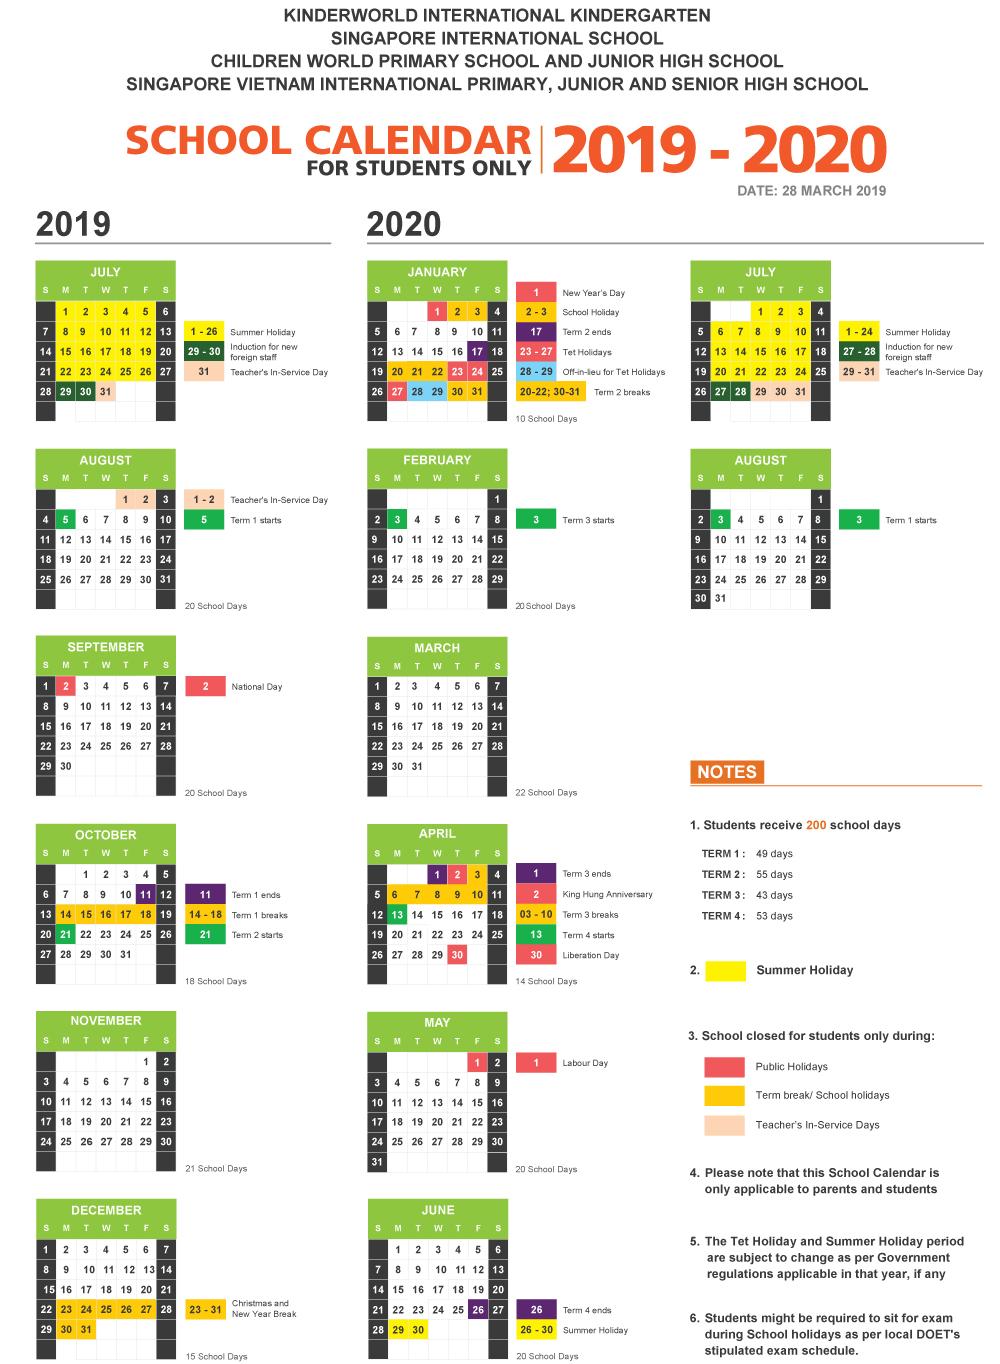 School calendar - KinderWorld International Kindergarten